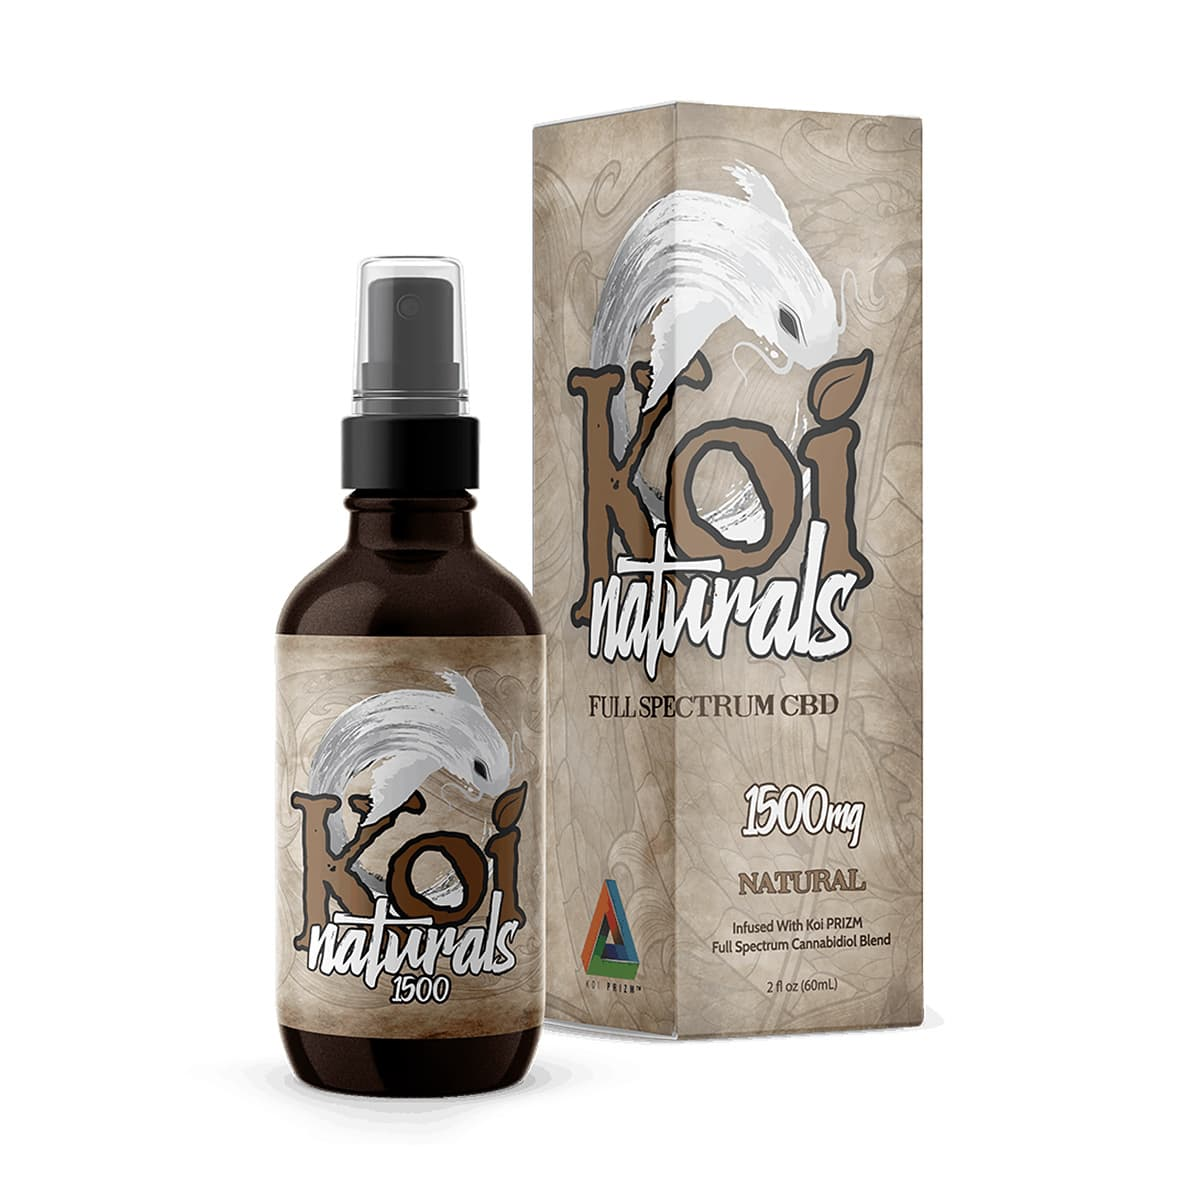 Koi CBD, CBD Oil Spray, Natural Flavor, 60ml, 1500mg of CBD